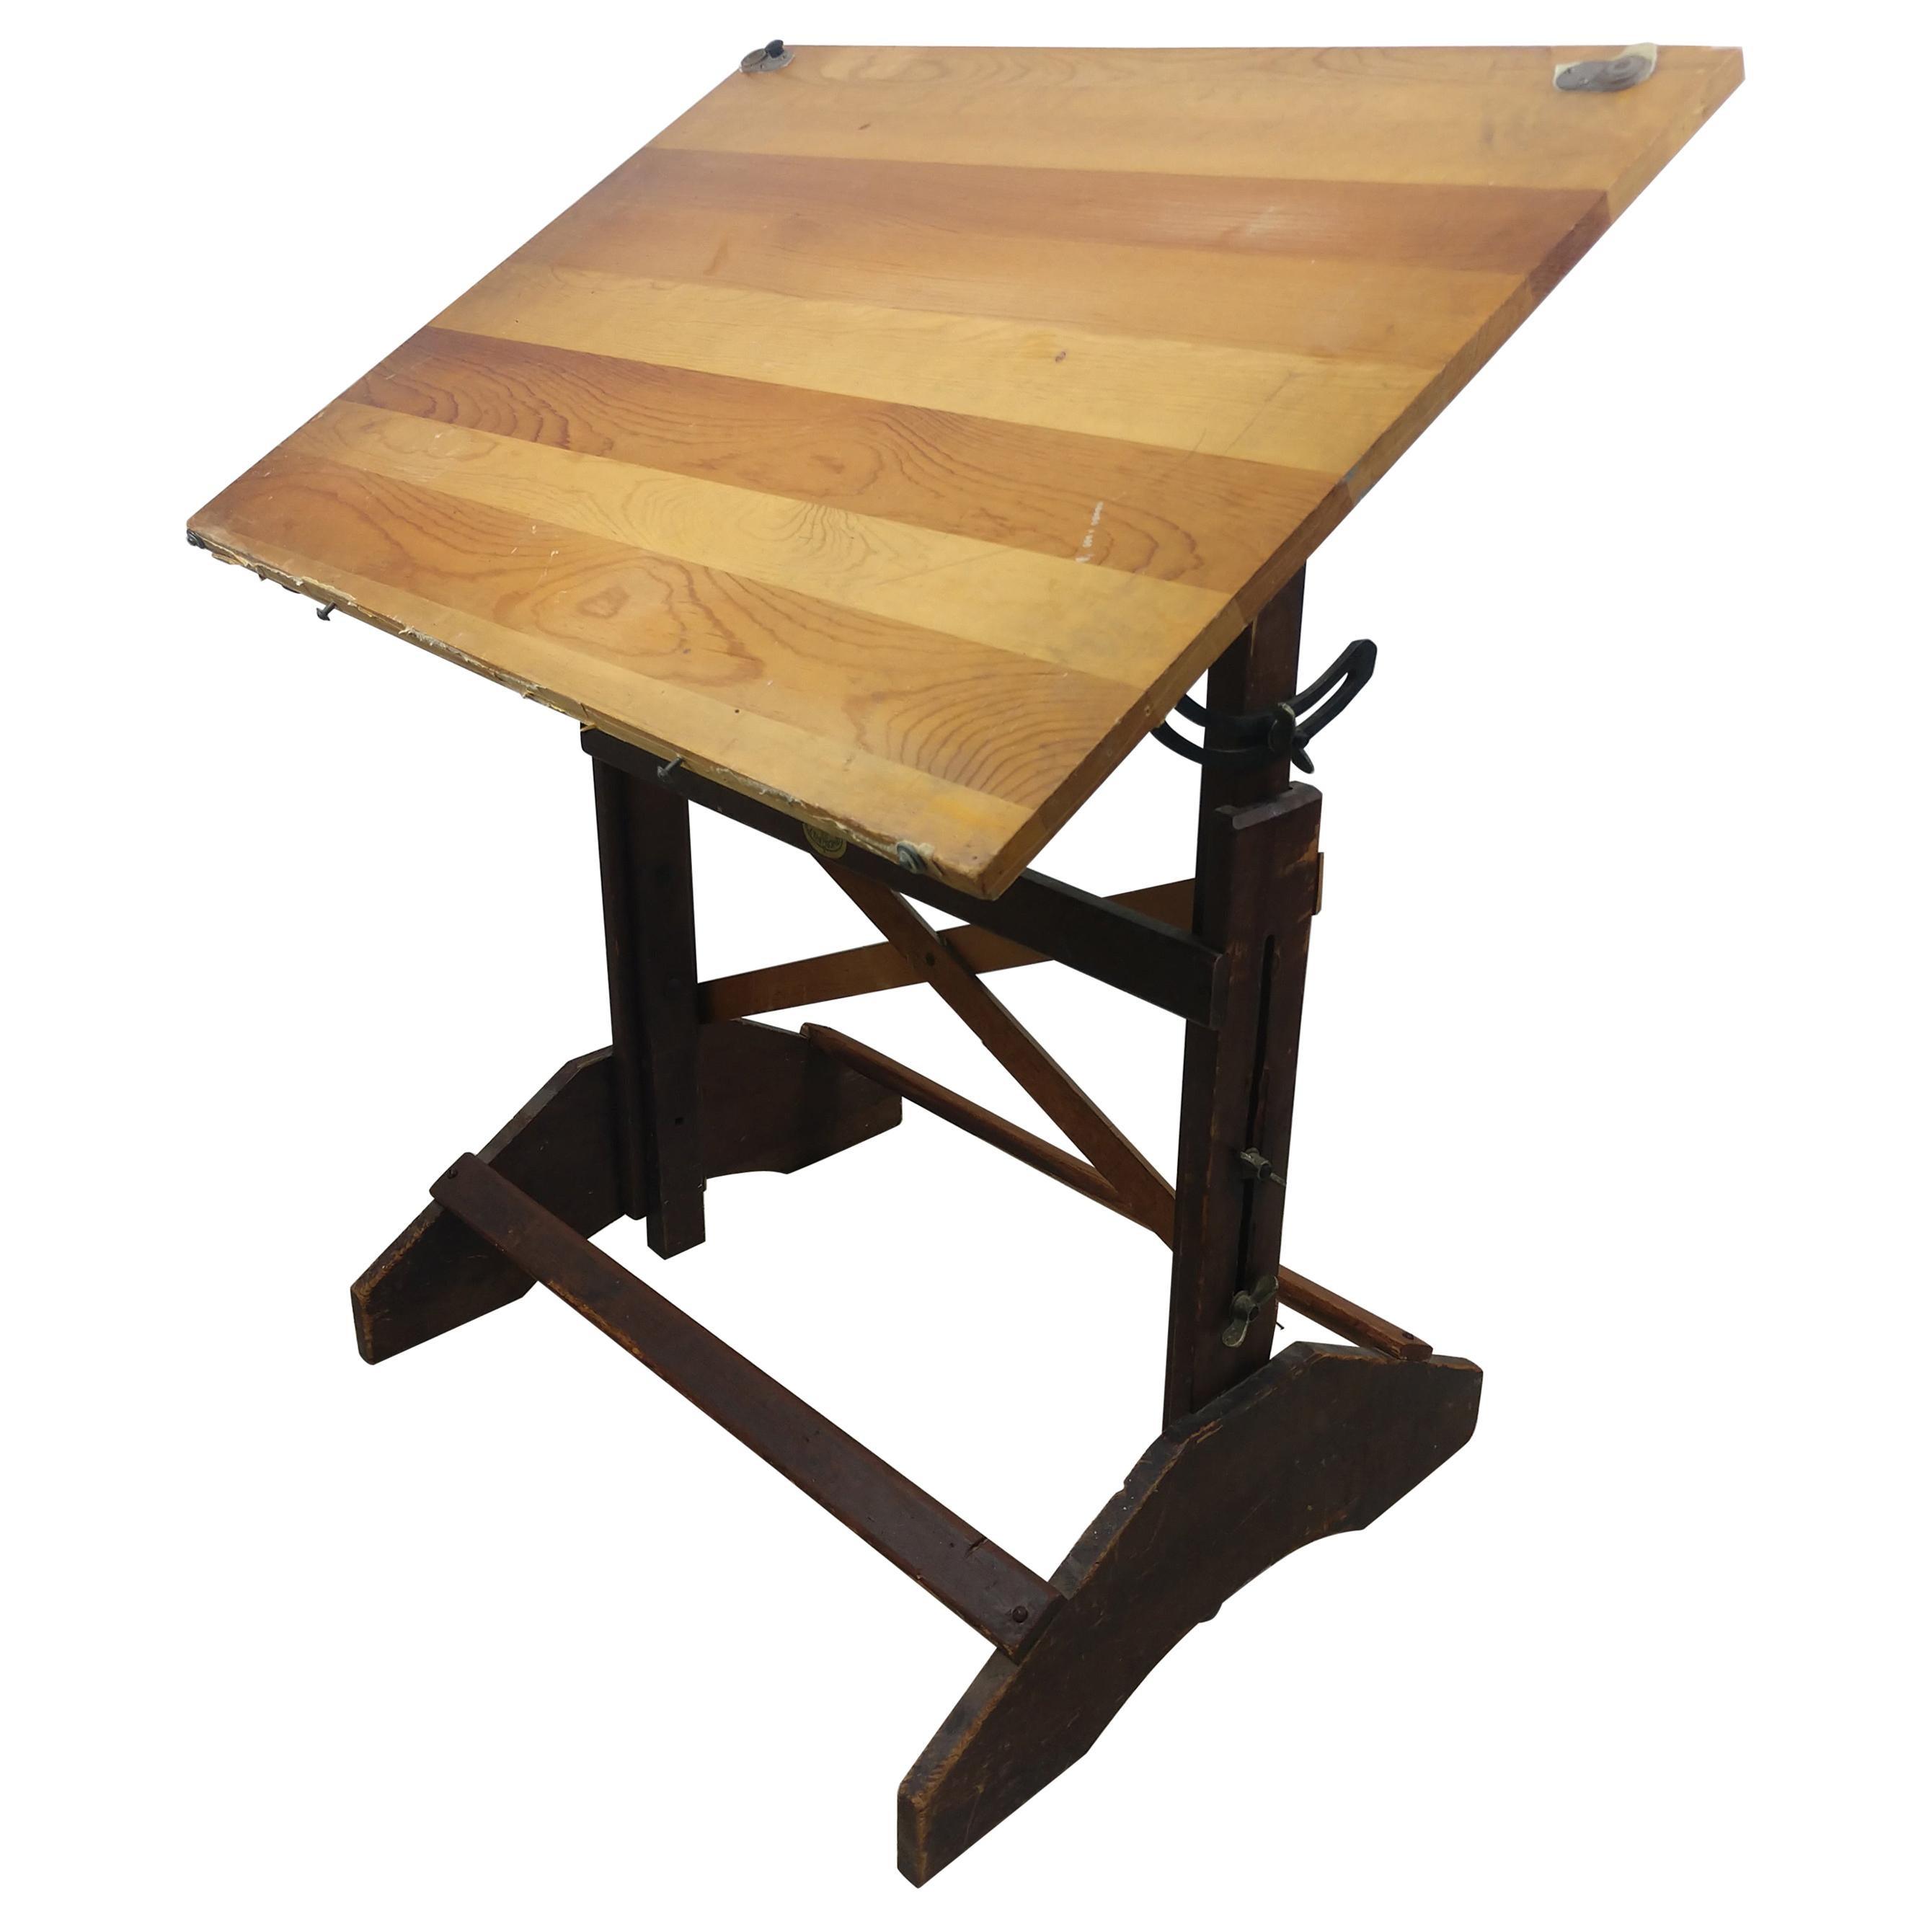 Anco Bilt Pine & Iron Drafting Table, C1955